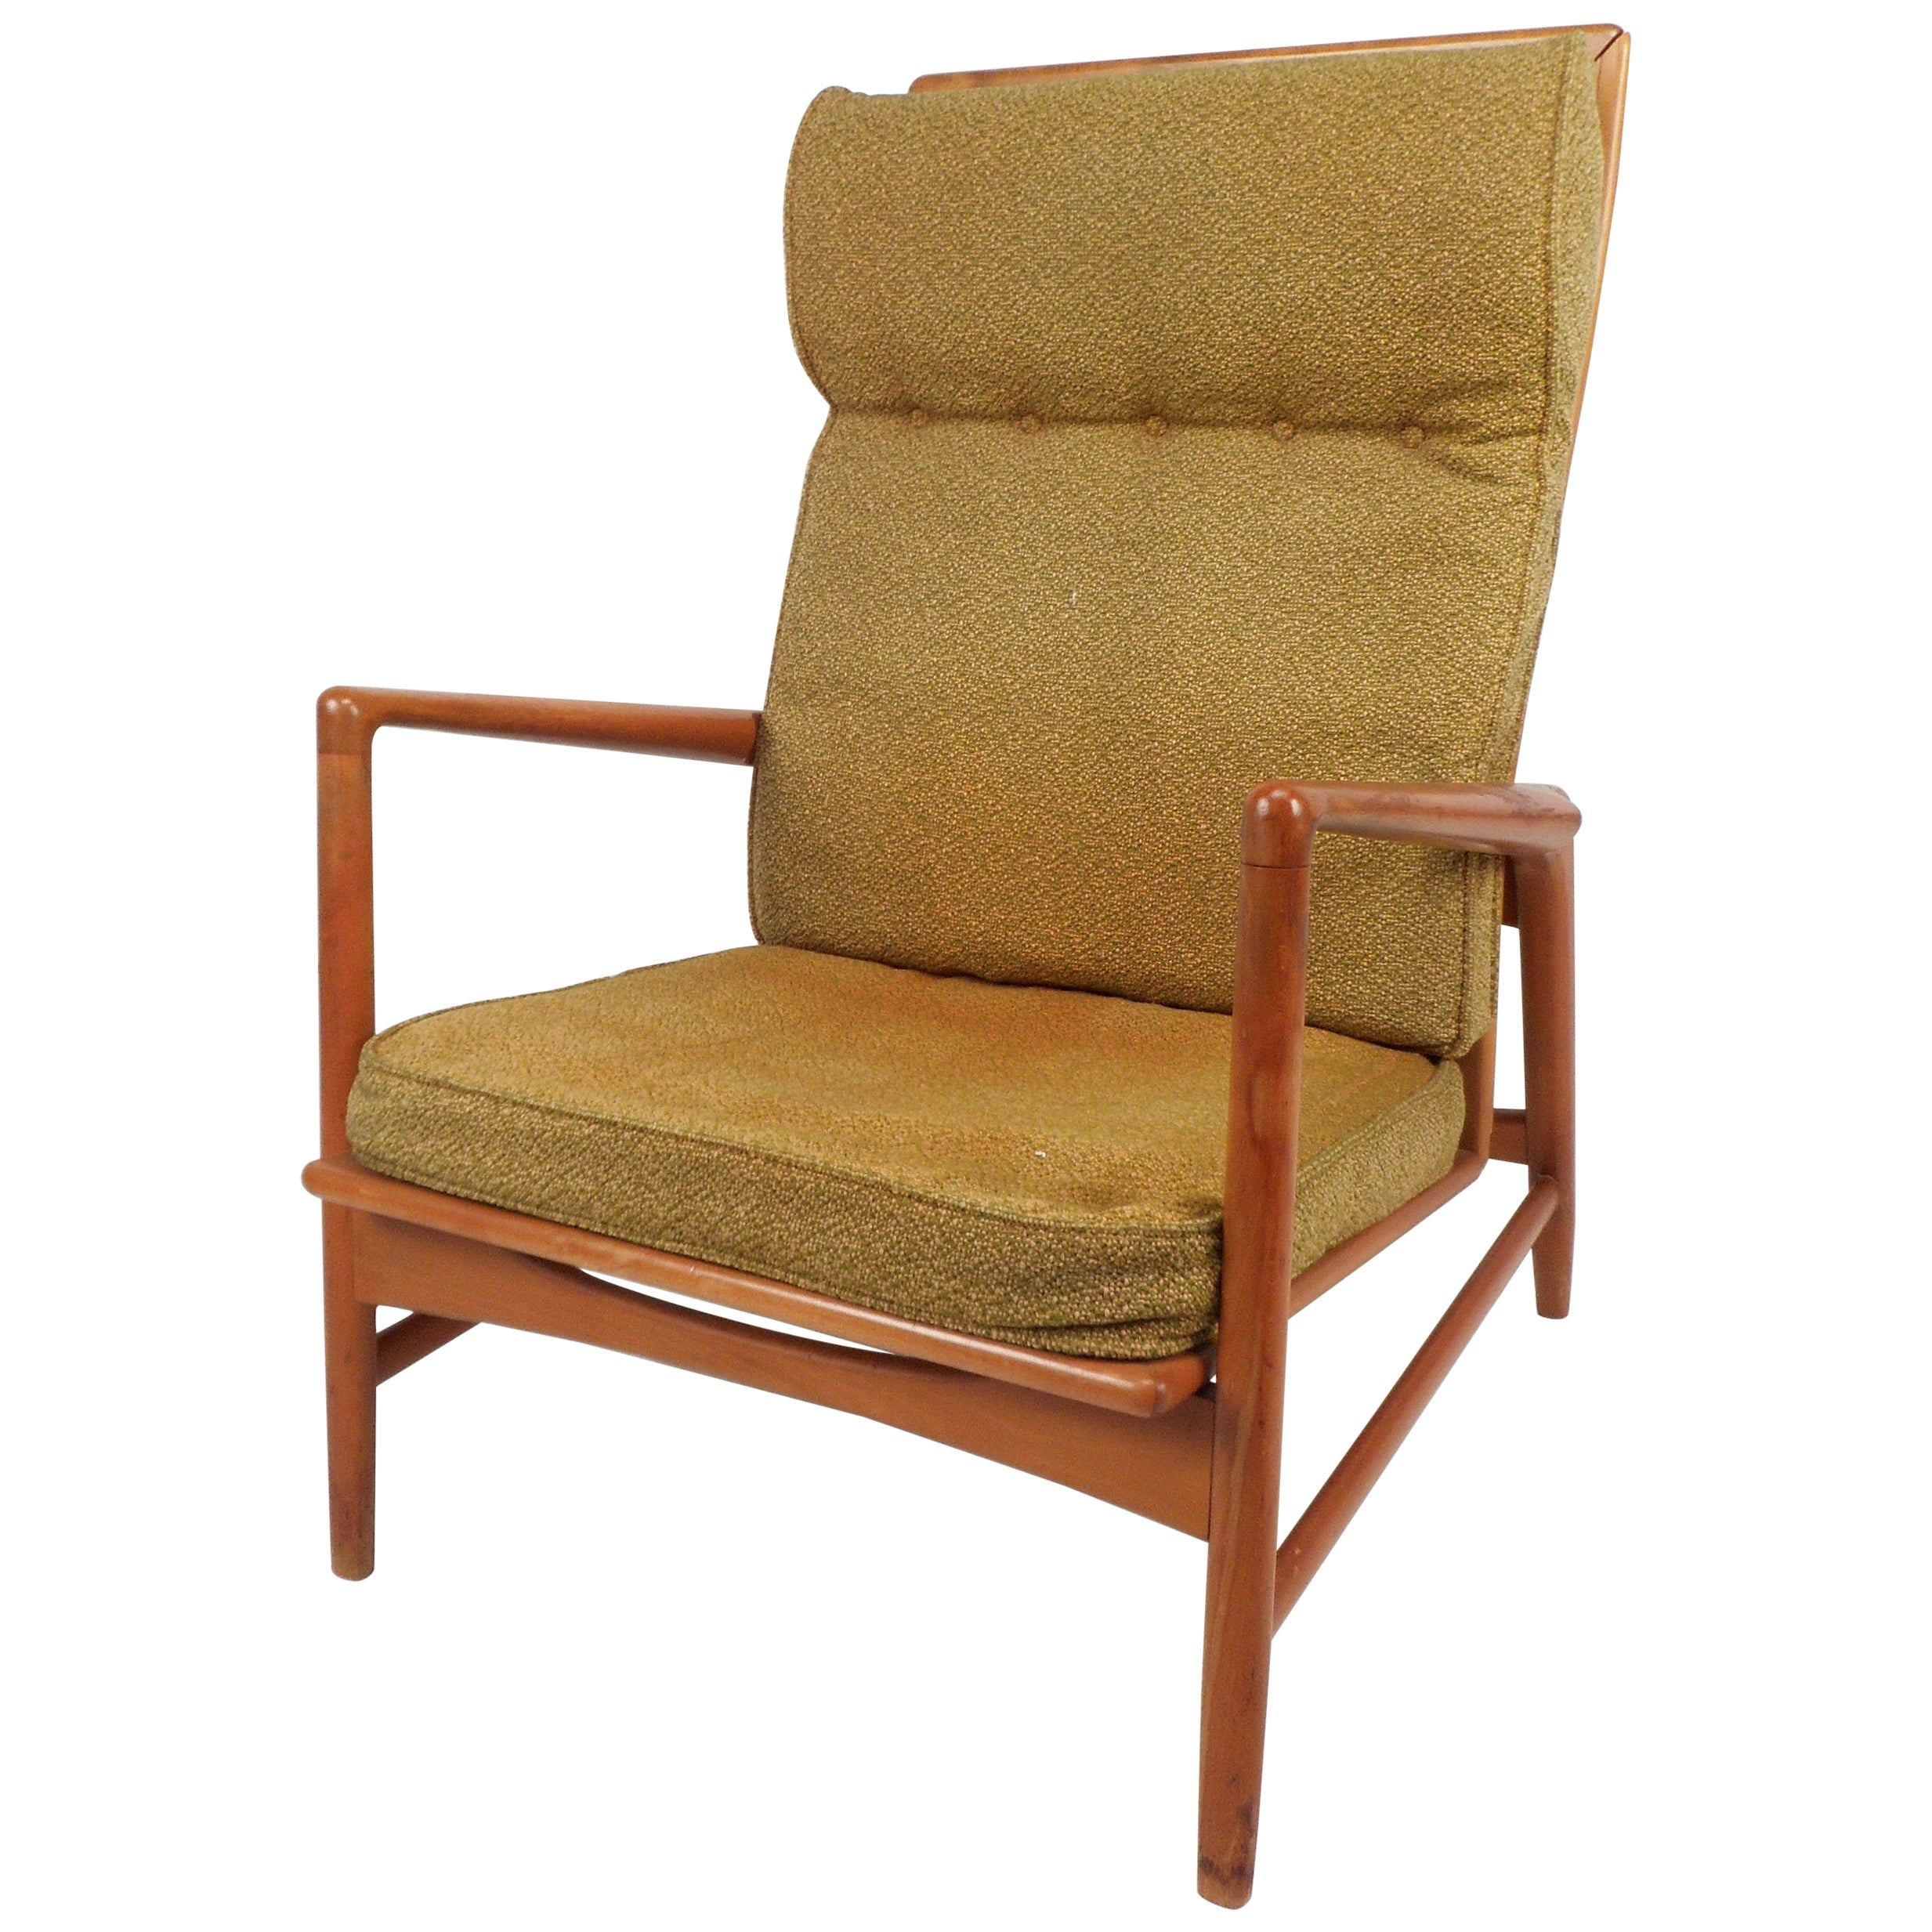 Vintage Reclining High Back Lounge Chair by Ib Kofod-Larsen